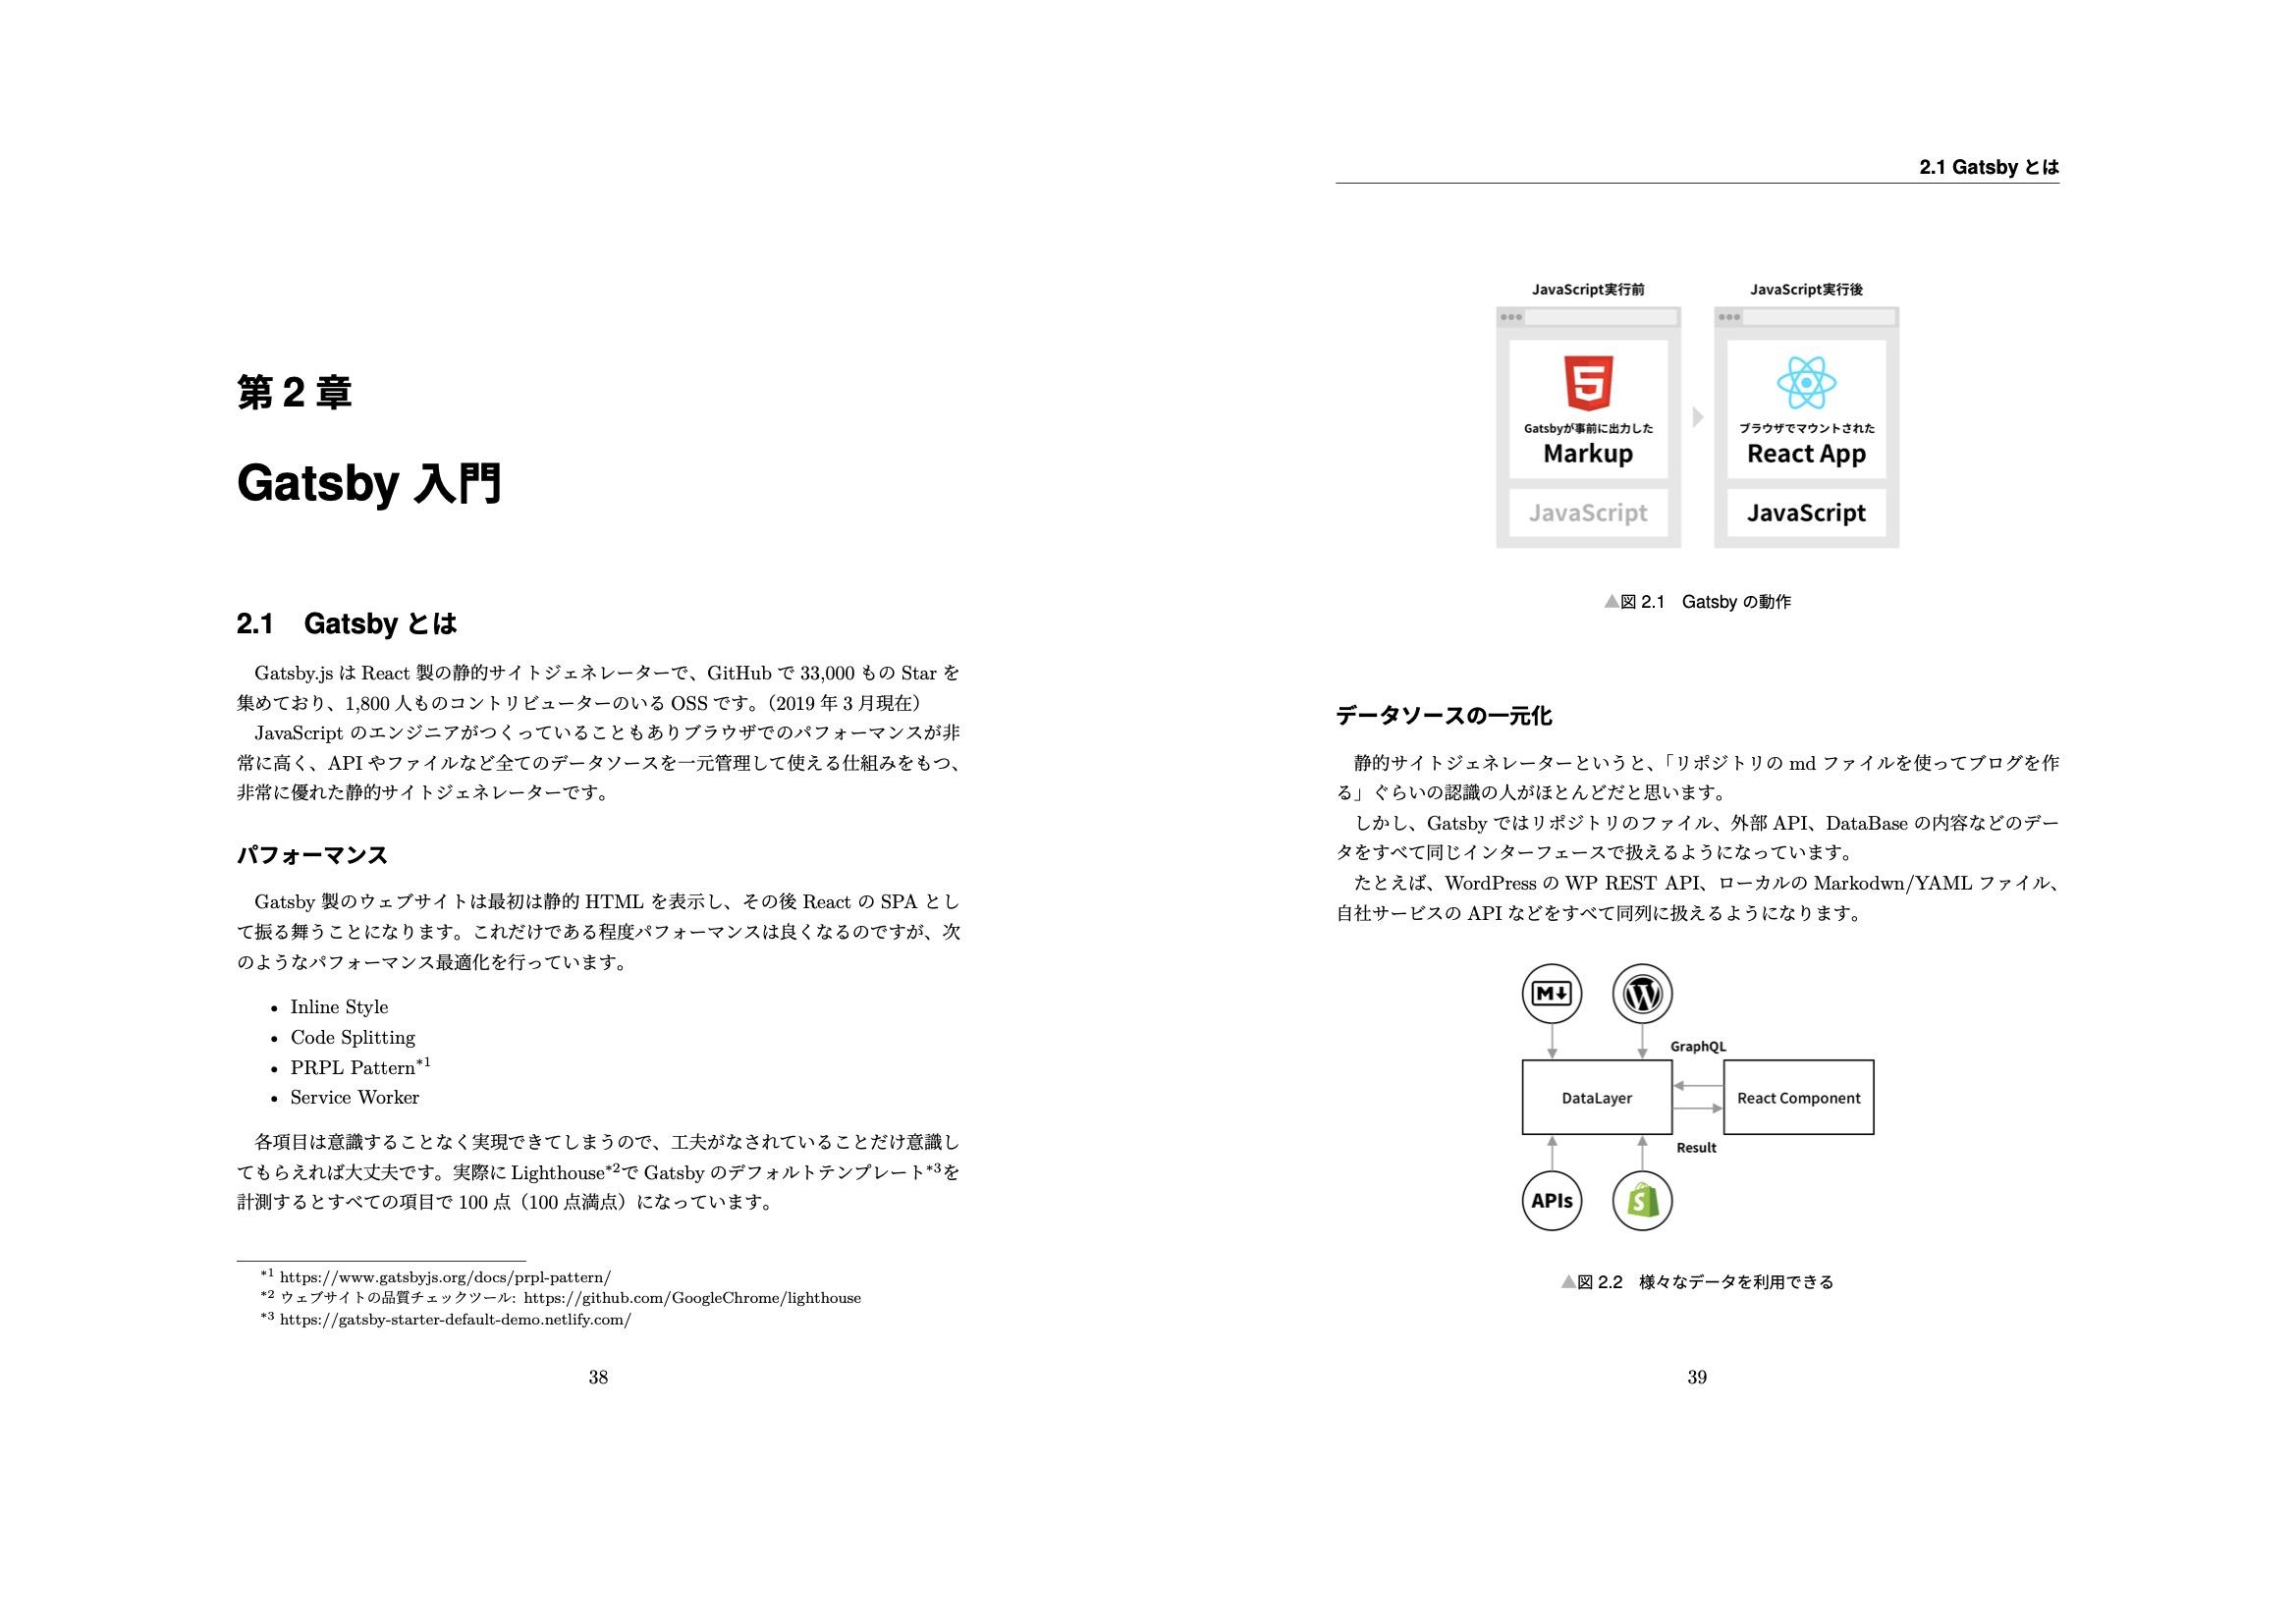 gatsby-guidebook3 19.jpeg (310.7 kB)